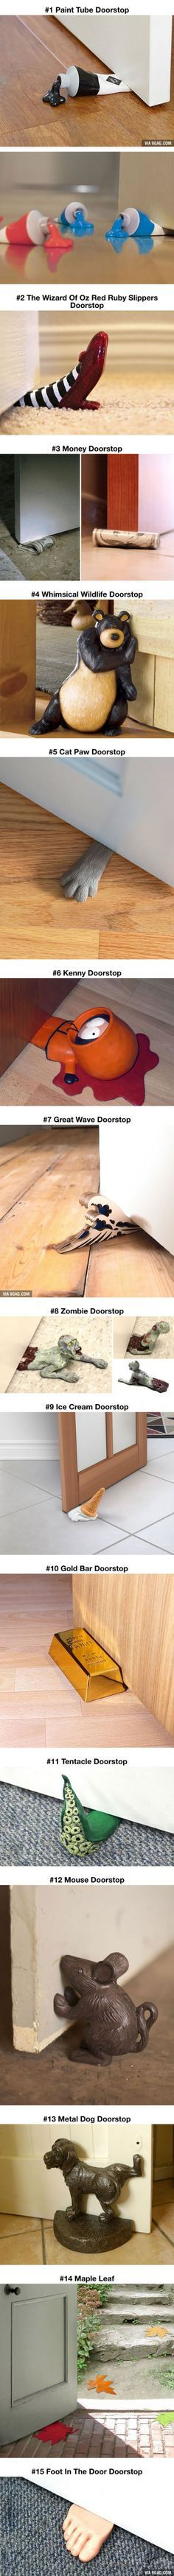 15 Fun Doorstops. You've Never Wanted A Doorstop This Much!